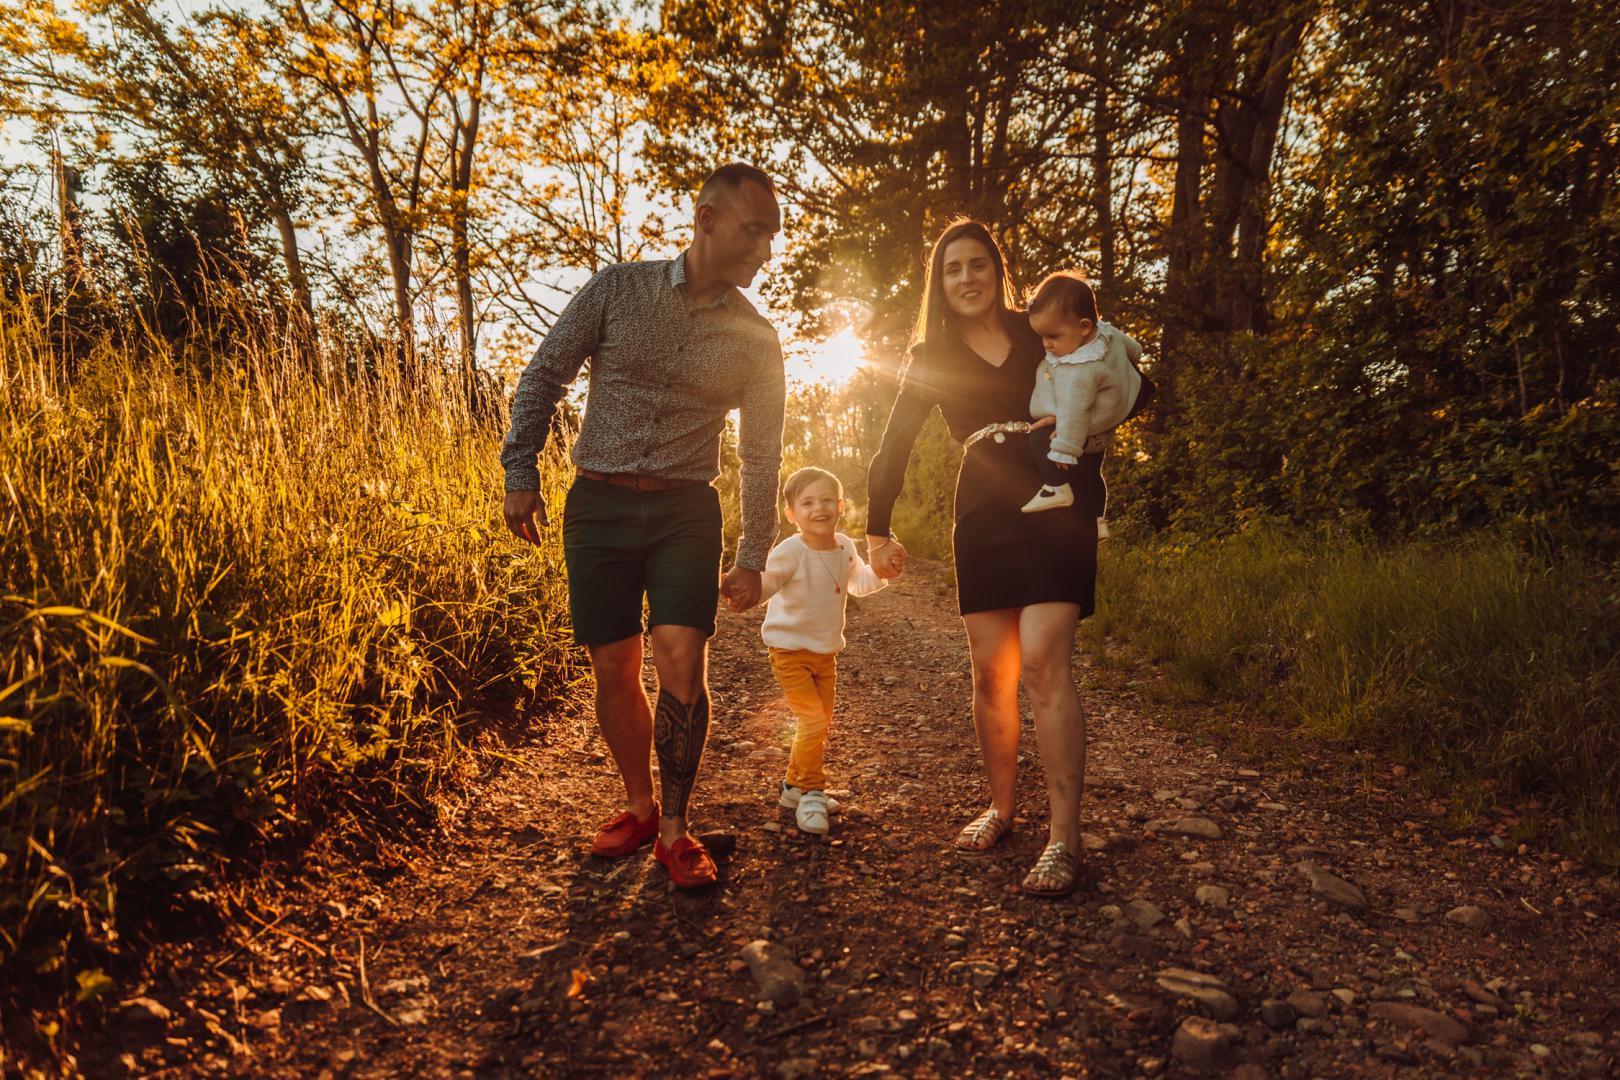 Photographe 68 - Photographe Mulhouse - Photographe Famille Alsace - Photographe Famille Mulhouse - Photographe Famille – Photographe Mulhouse Bertrand DISDIER-536- Bertrand DISDIER